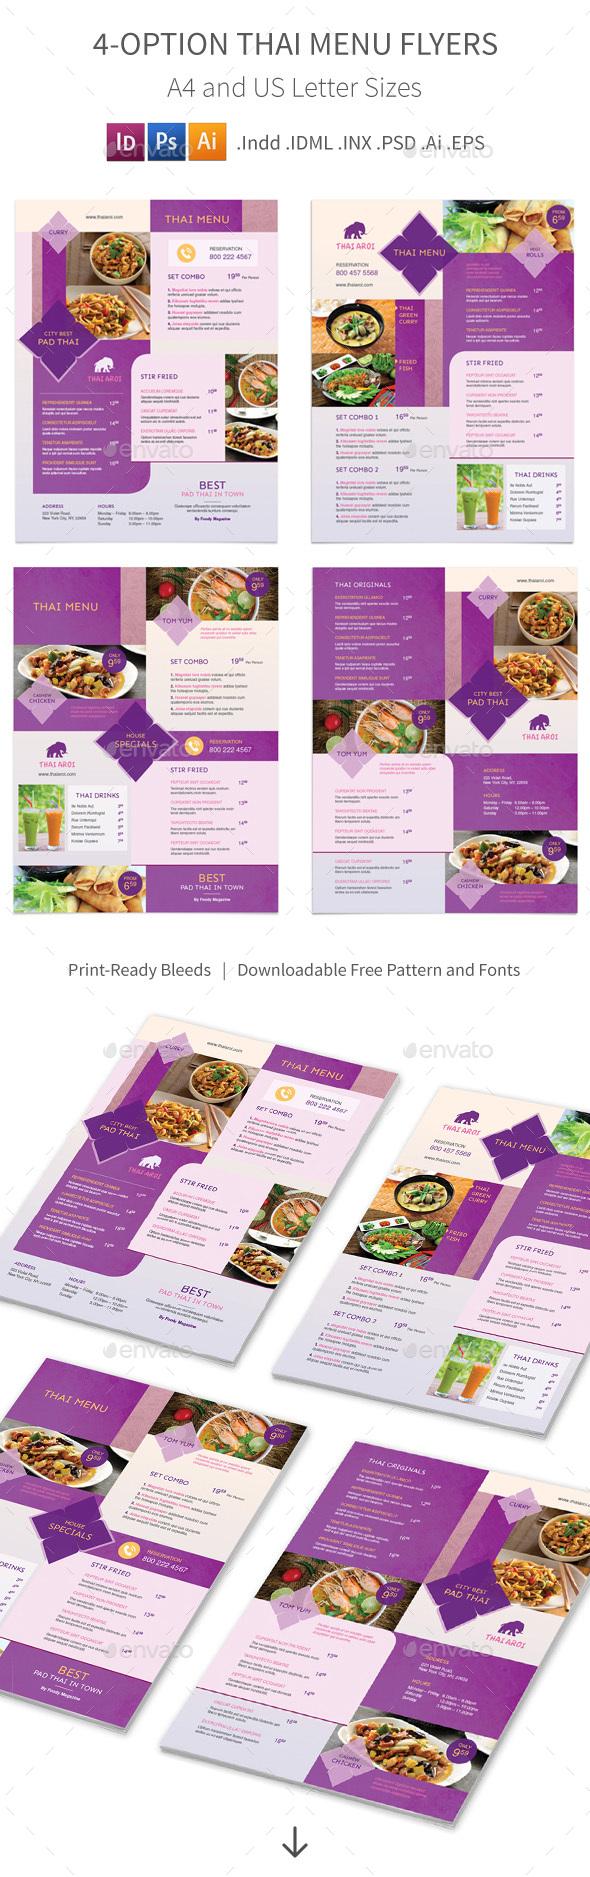 Thai Restaurant Menu Flyers 3 – 4 Options